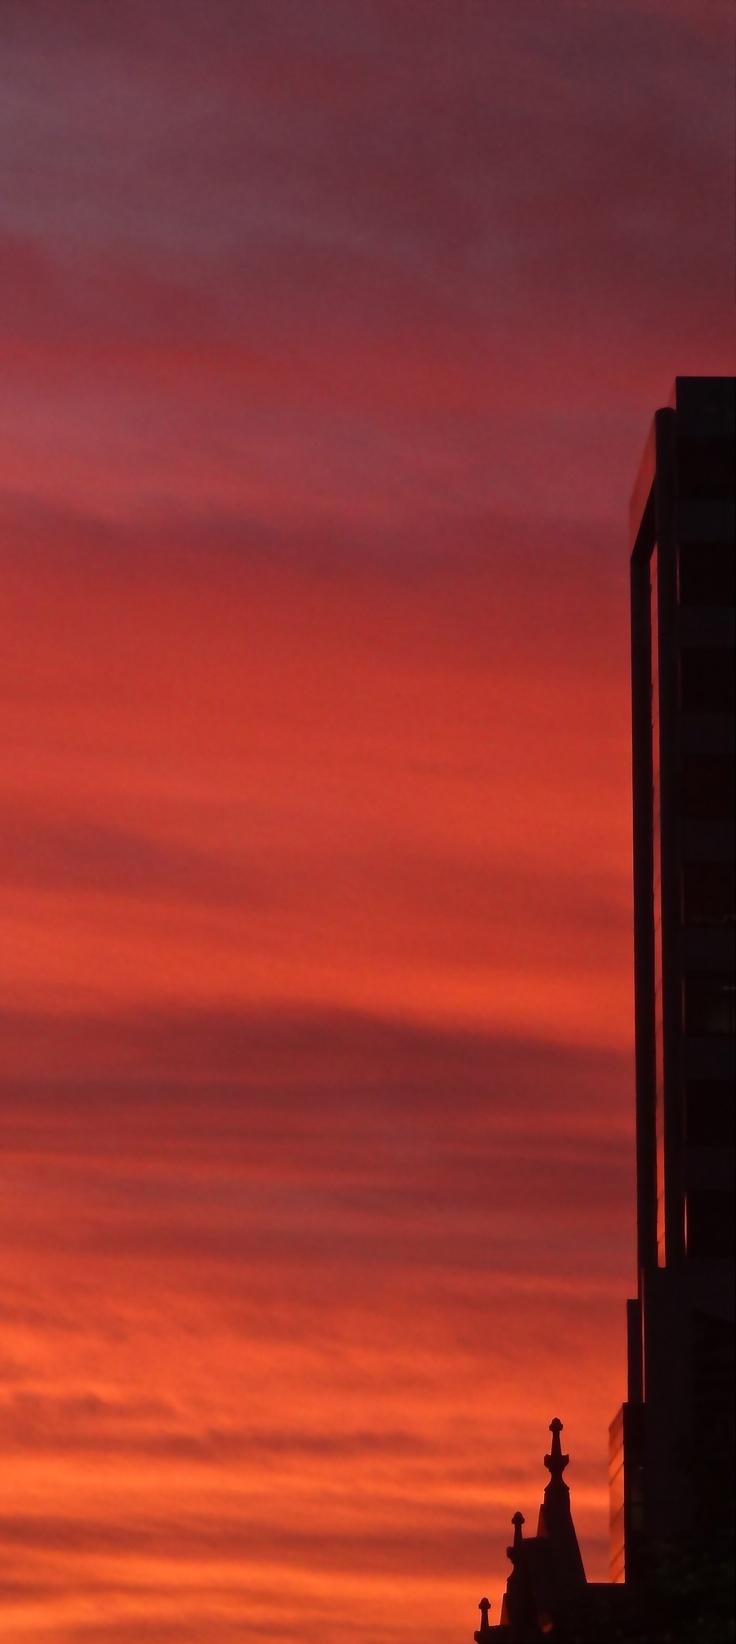 Red Sky at Night~  #sydney #sunset #orange